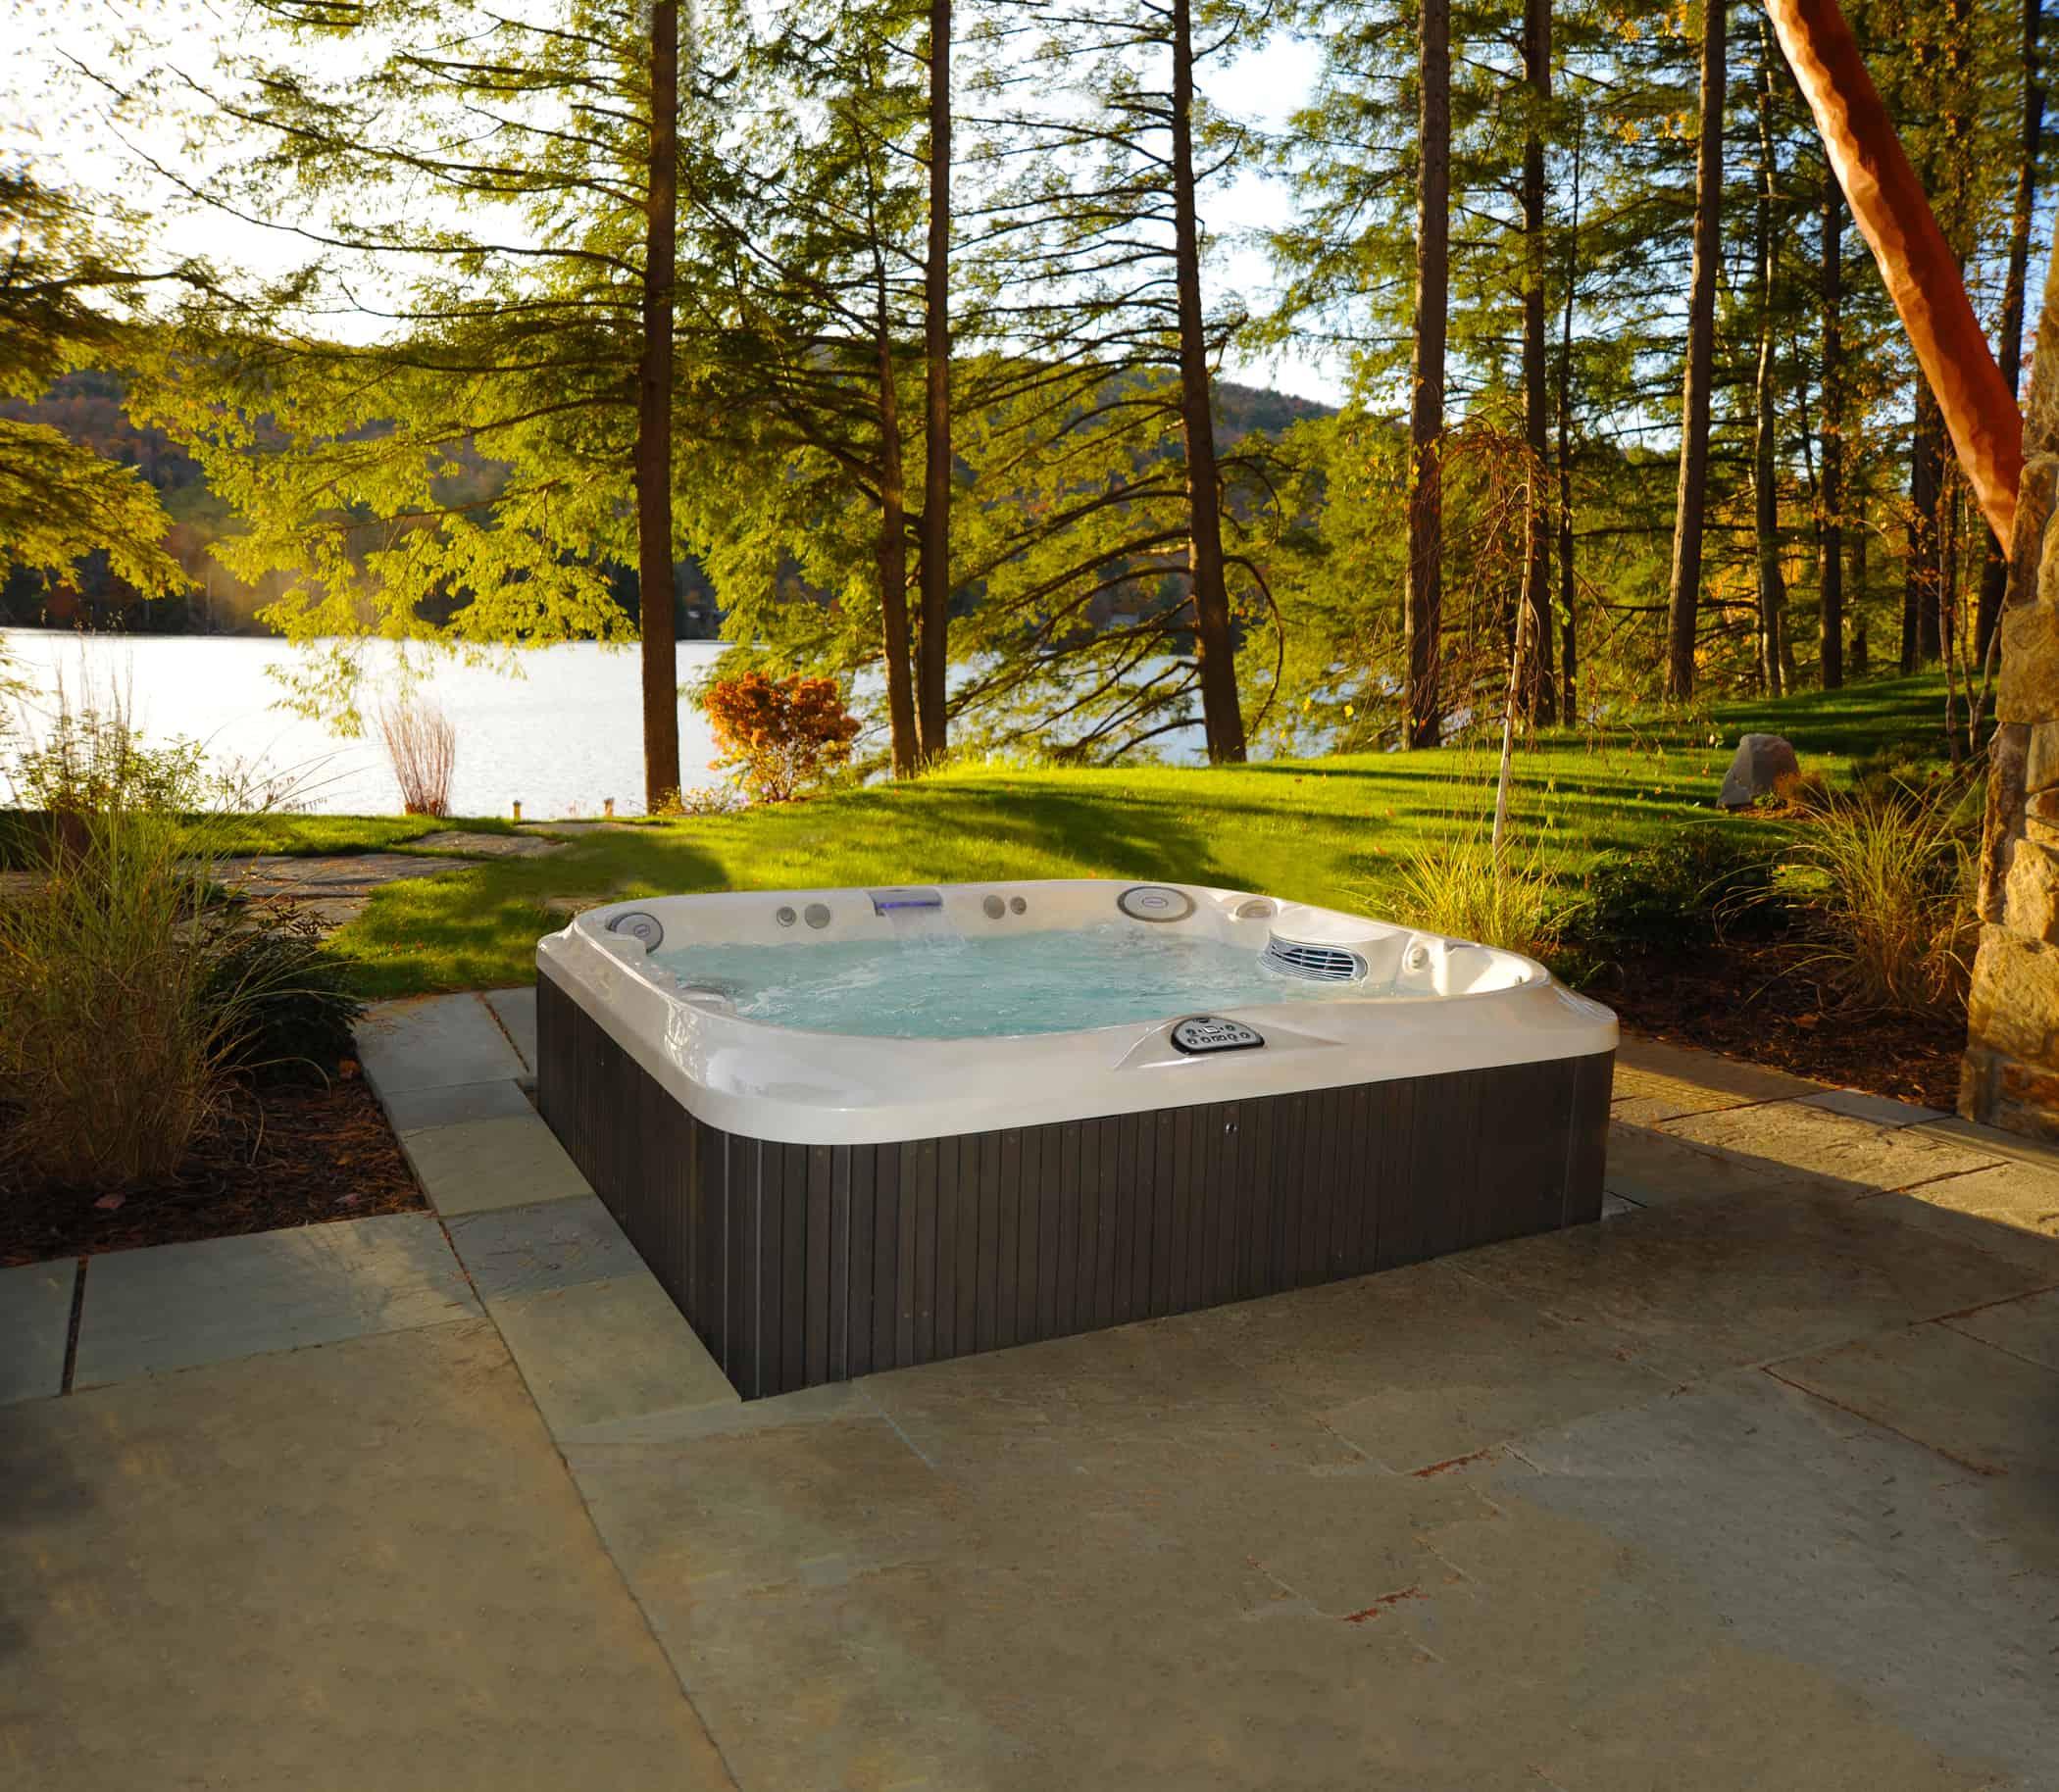 Hot Tubs vs Swim Spas